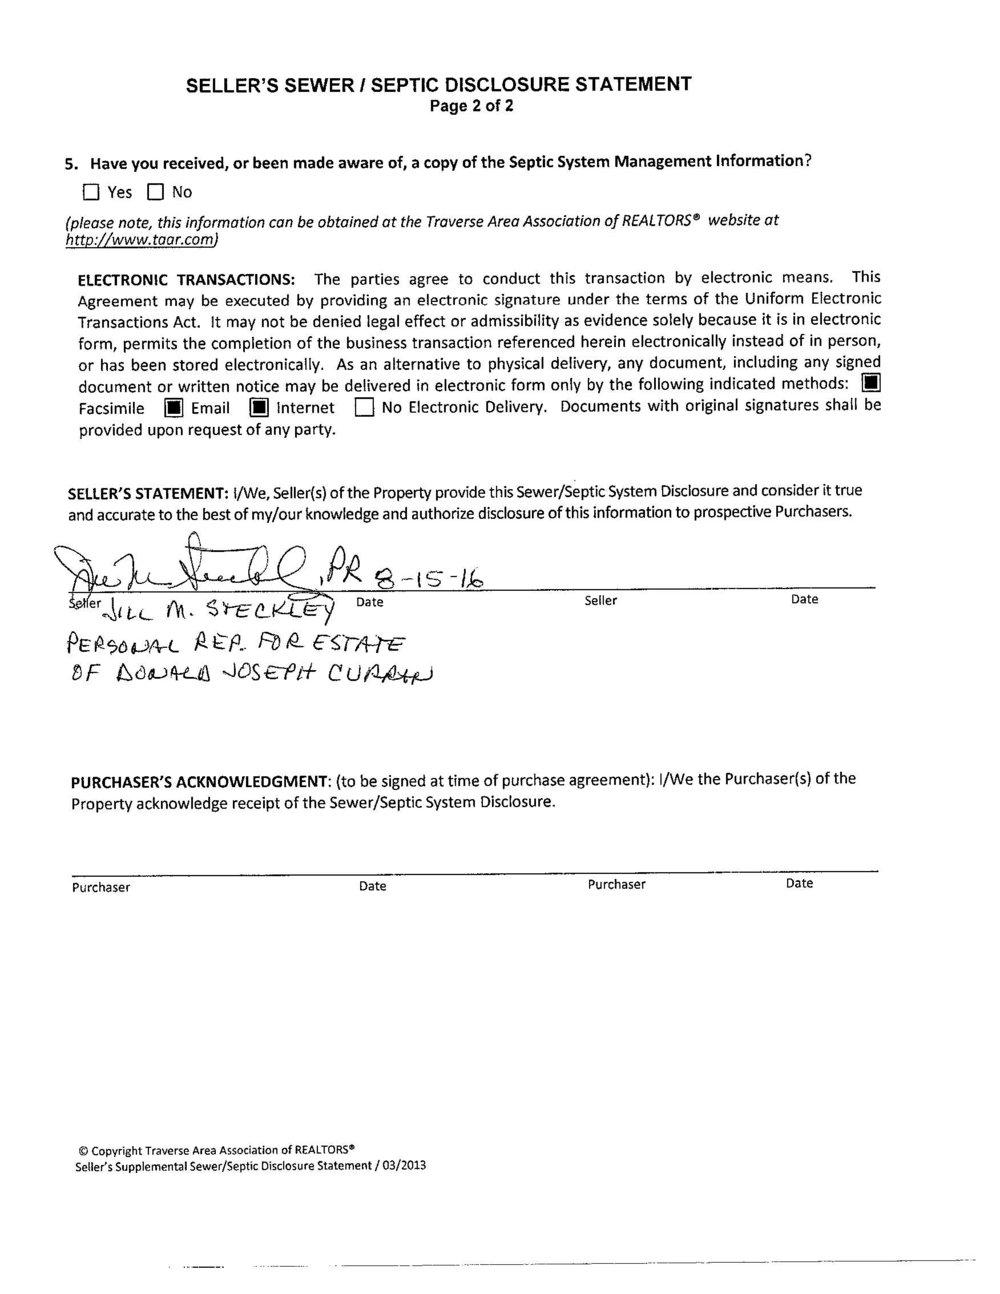 4903 Waldon Circle, Traverse City, MI – 3 Bedroom & 2 Bath Ranch Home for sale by Oltersdorf Realty LLC marketing packet (13).jpg